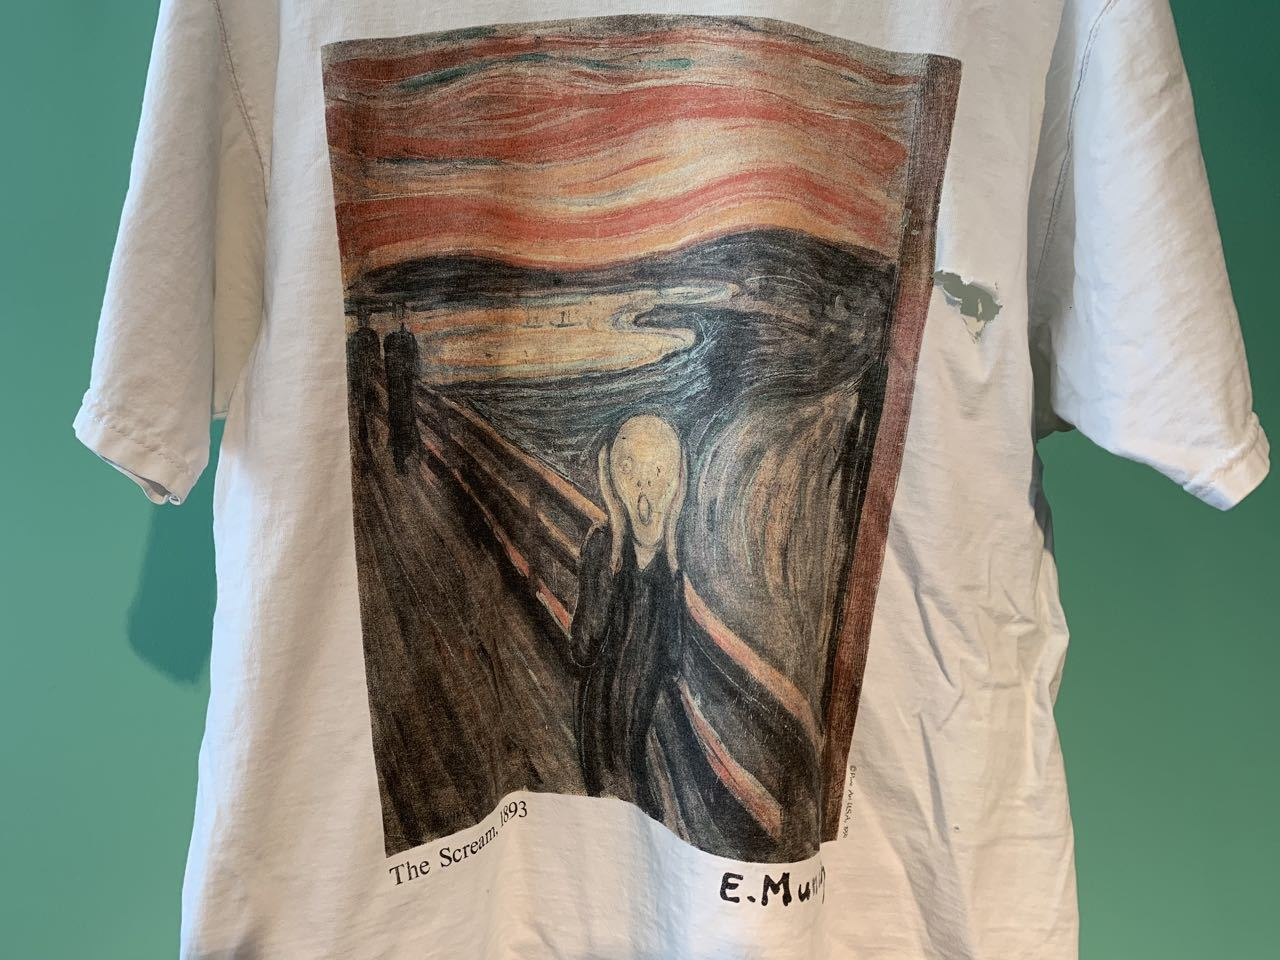 90s アメリカ製 ムンク 『叫び』 Tシャツ!_c0144020_11431374.jpg